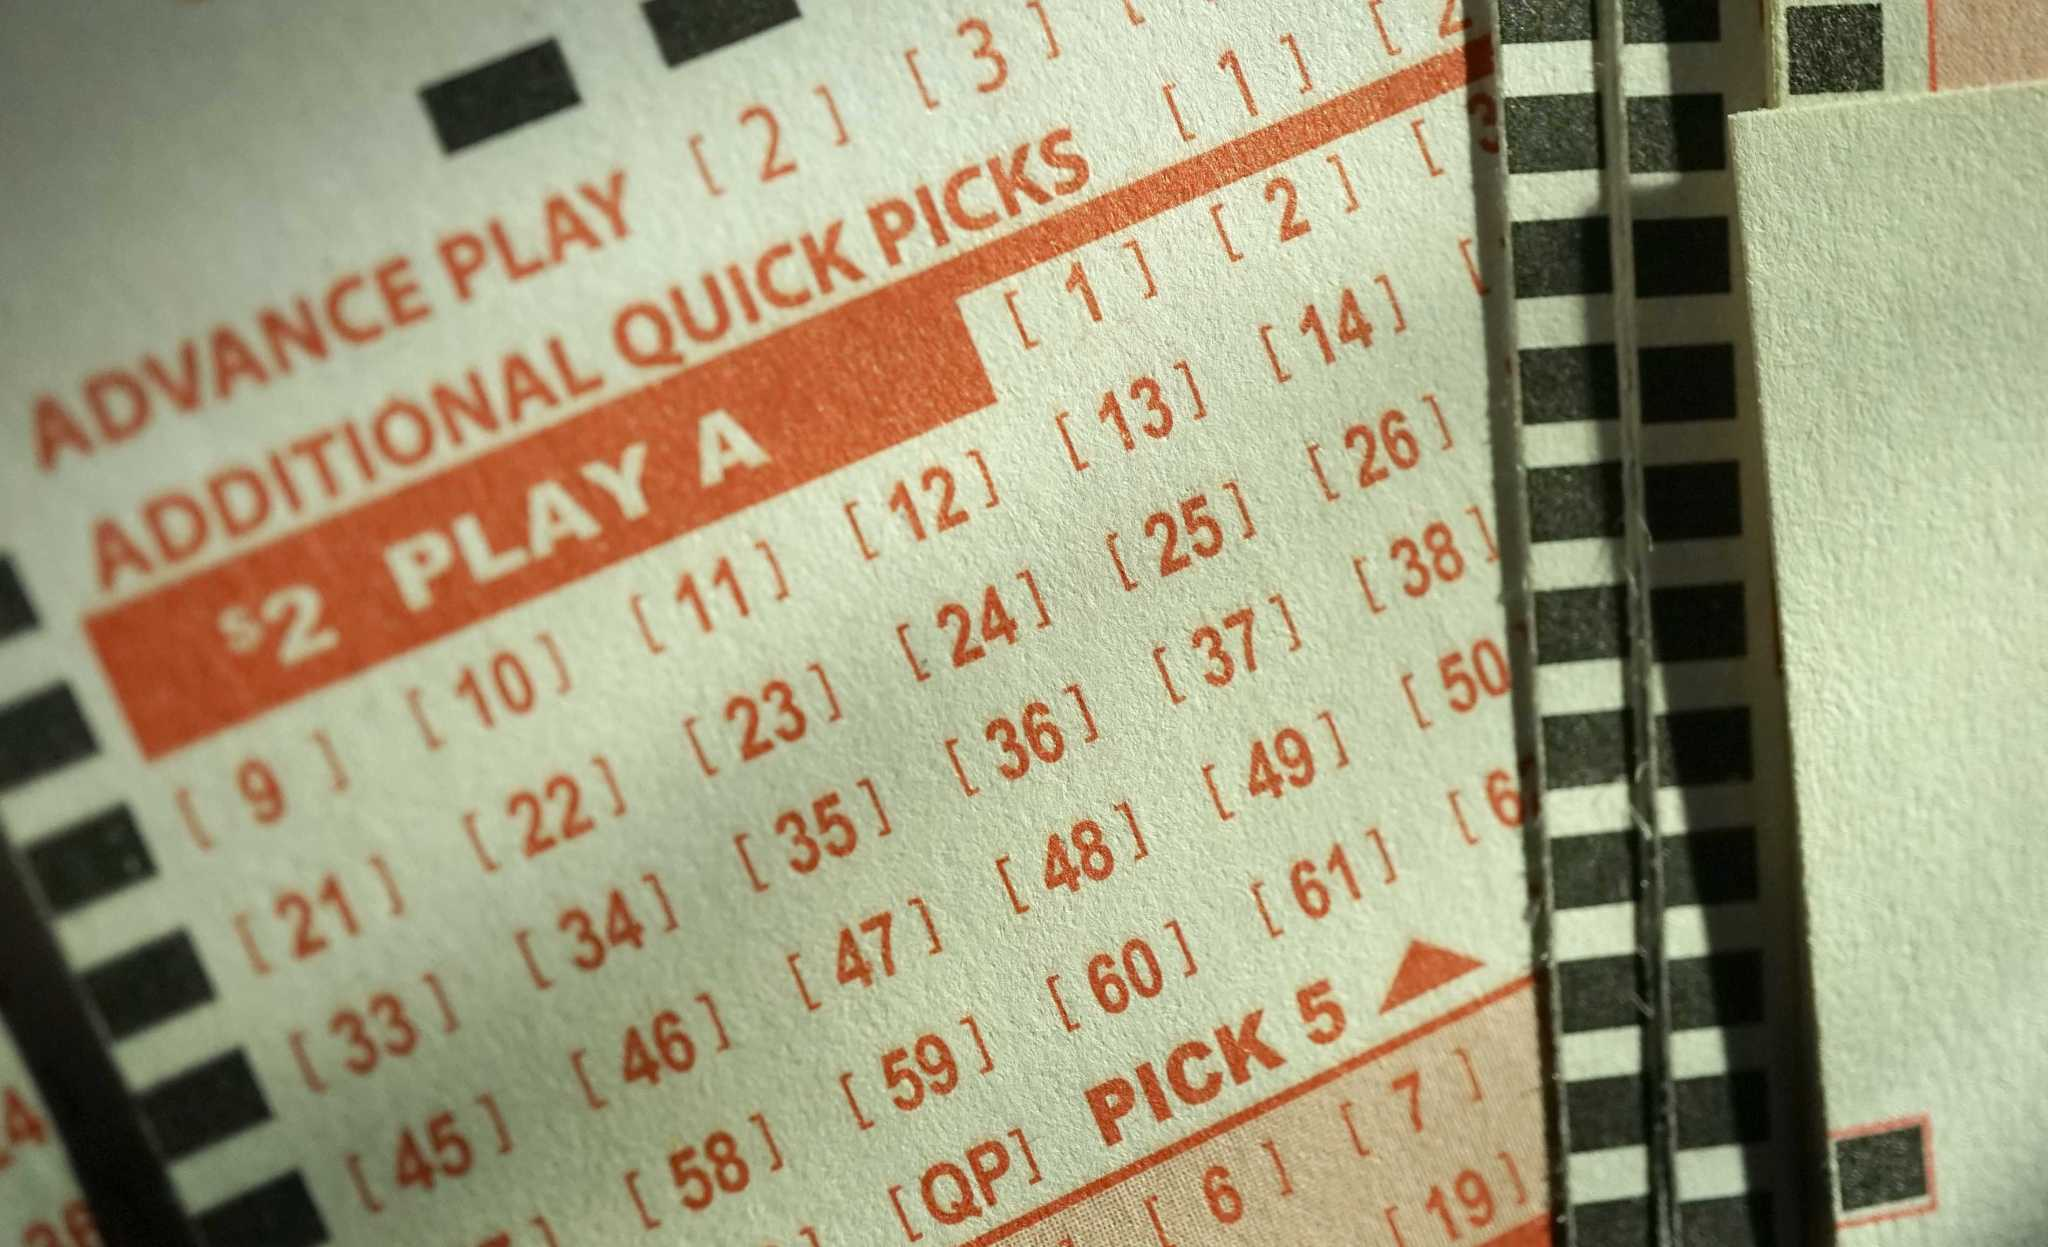 Two-time cancer survivor wins $4.6 million lottery jackpot